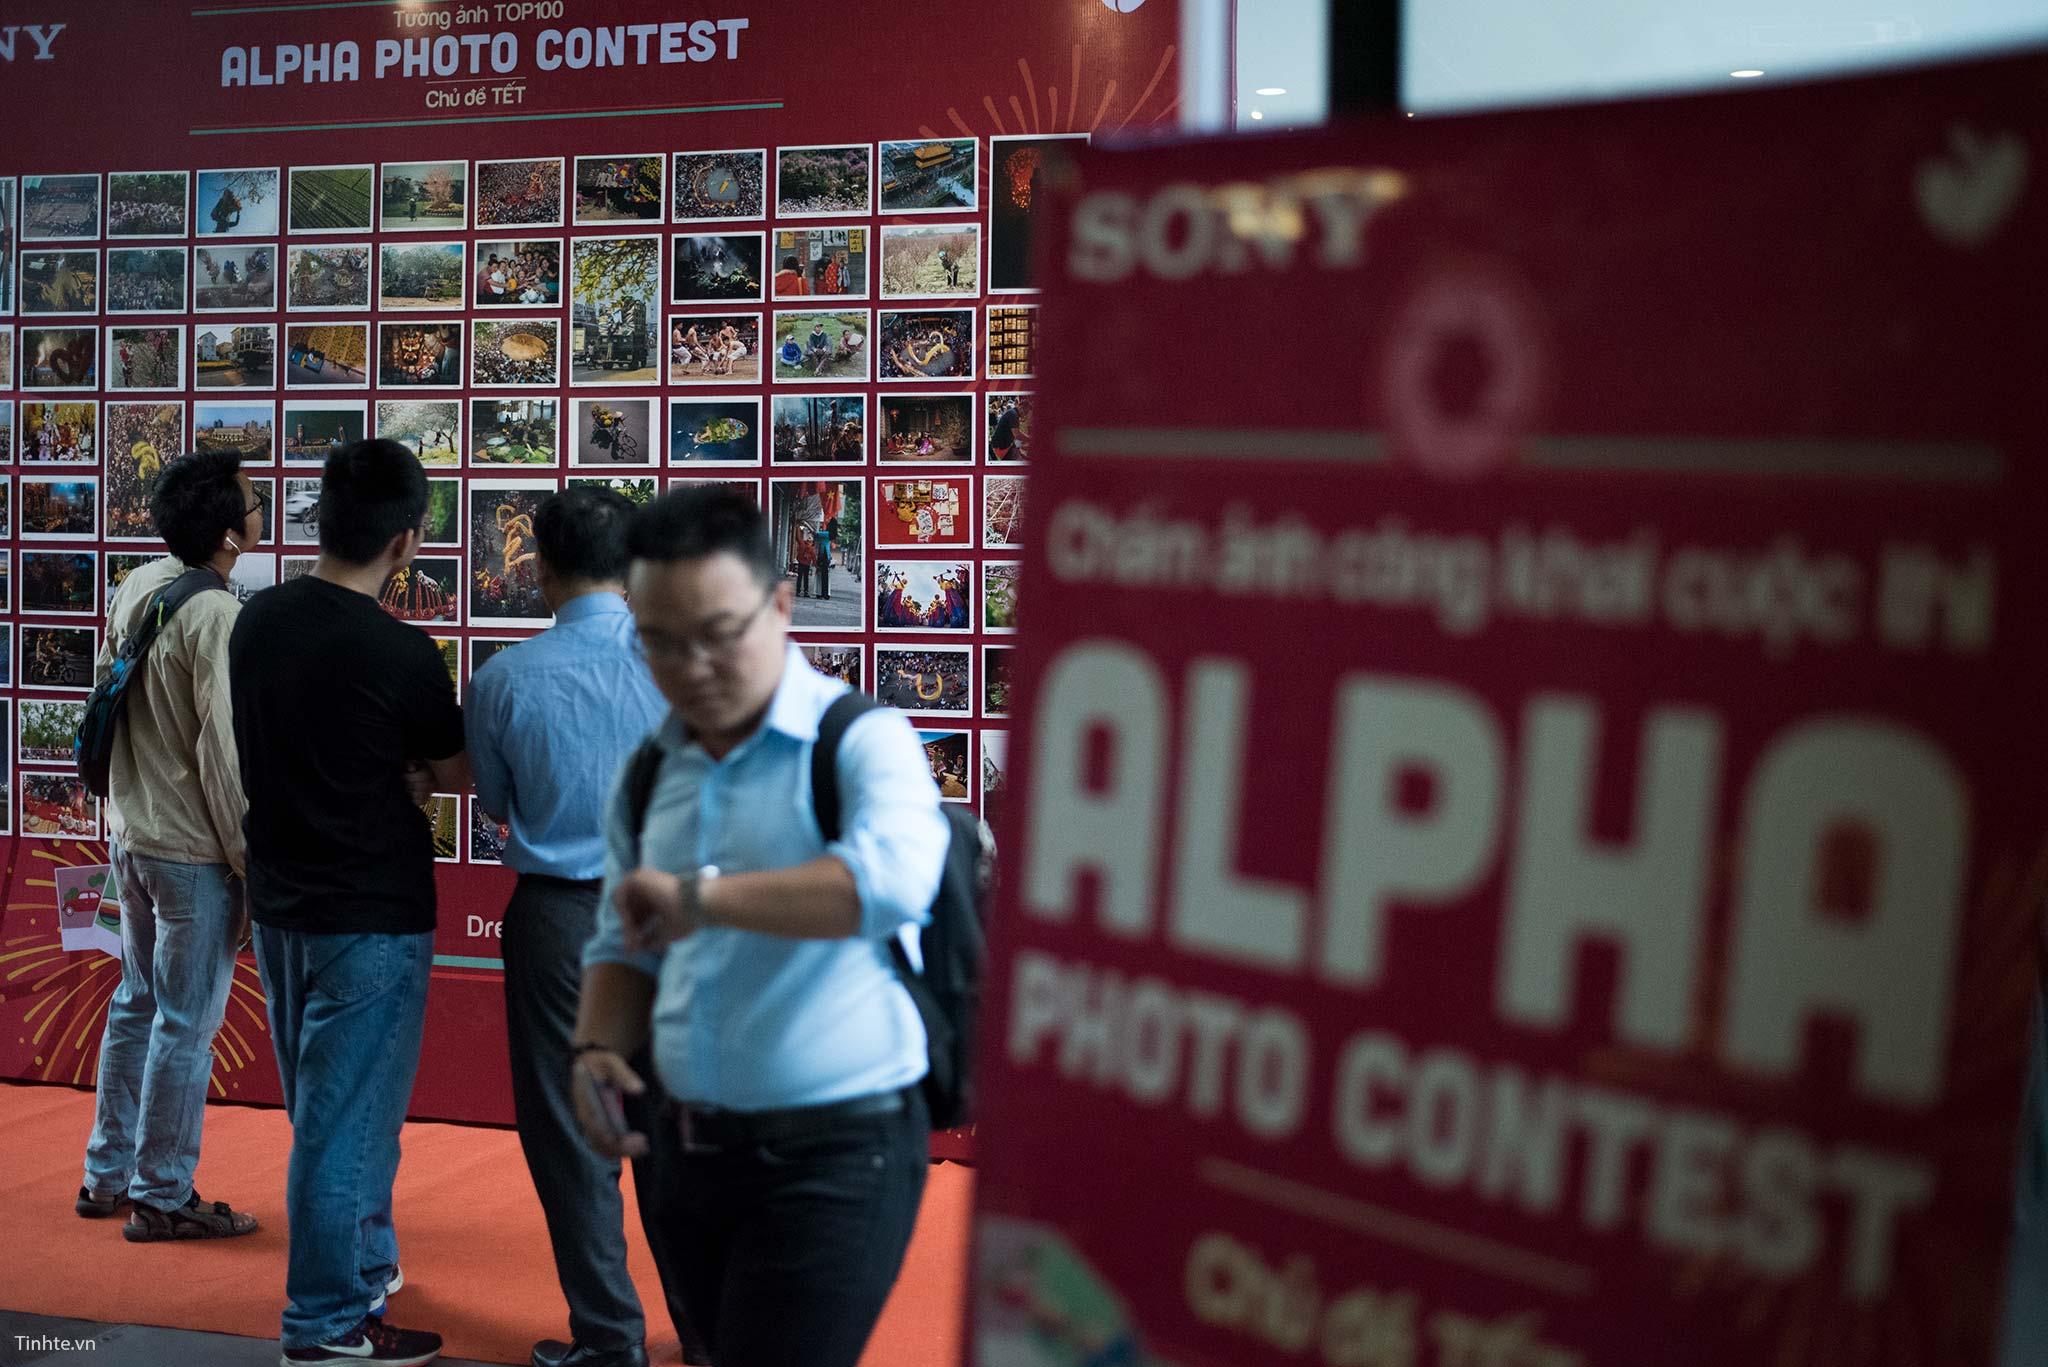 alphaphotocontest-camera.tinhte.vn-11.jpg